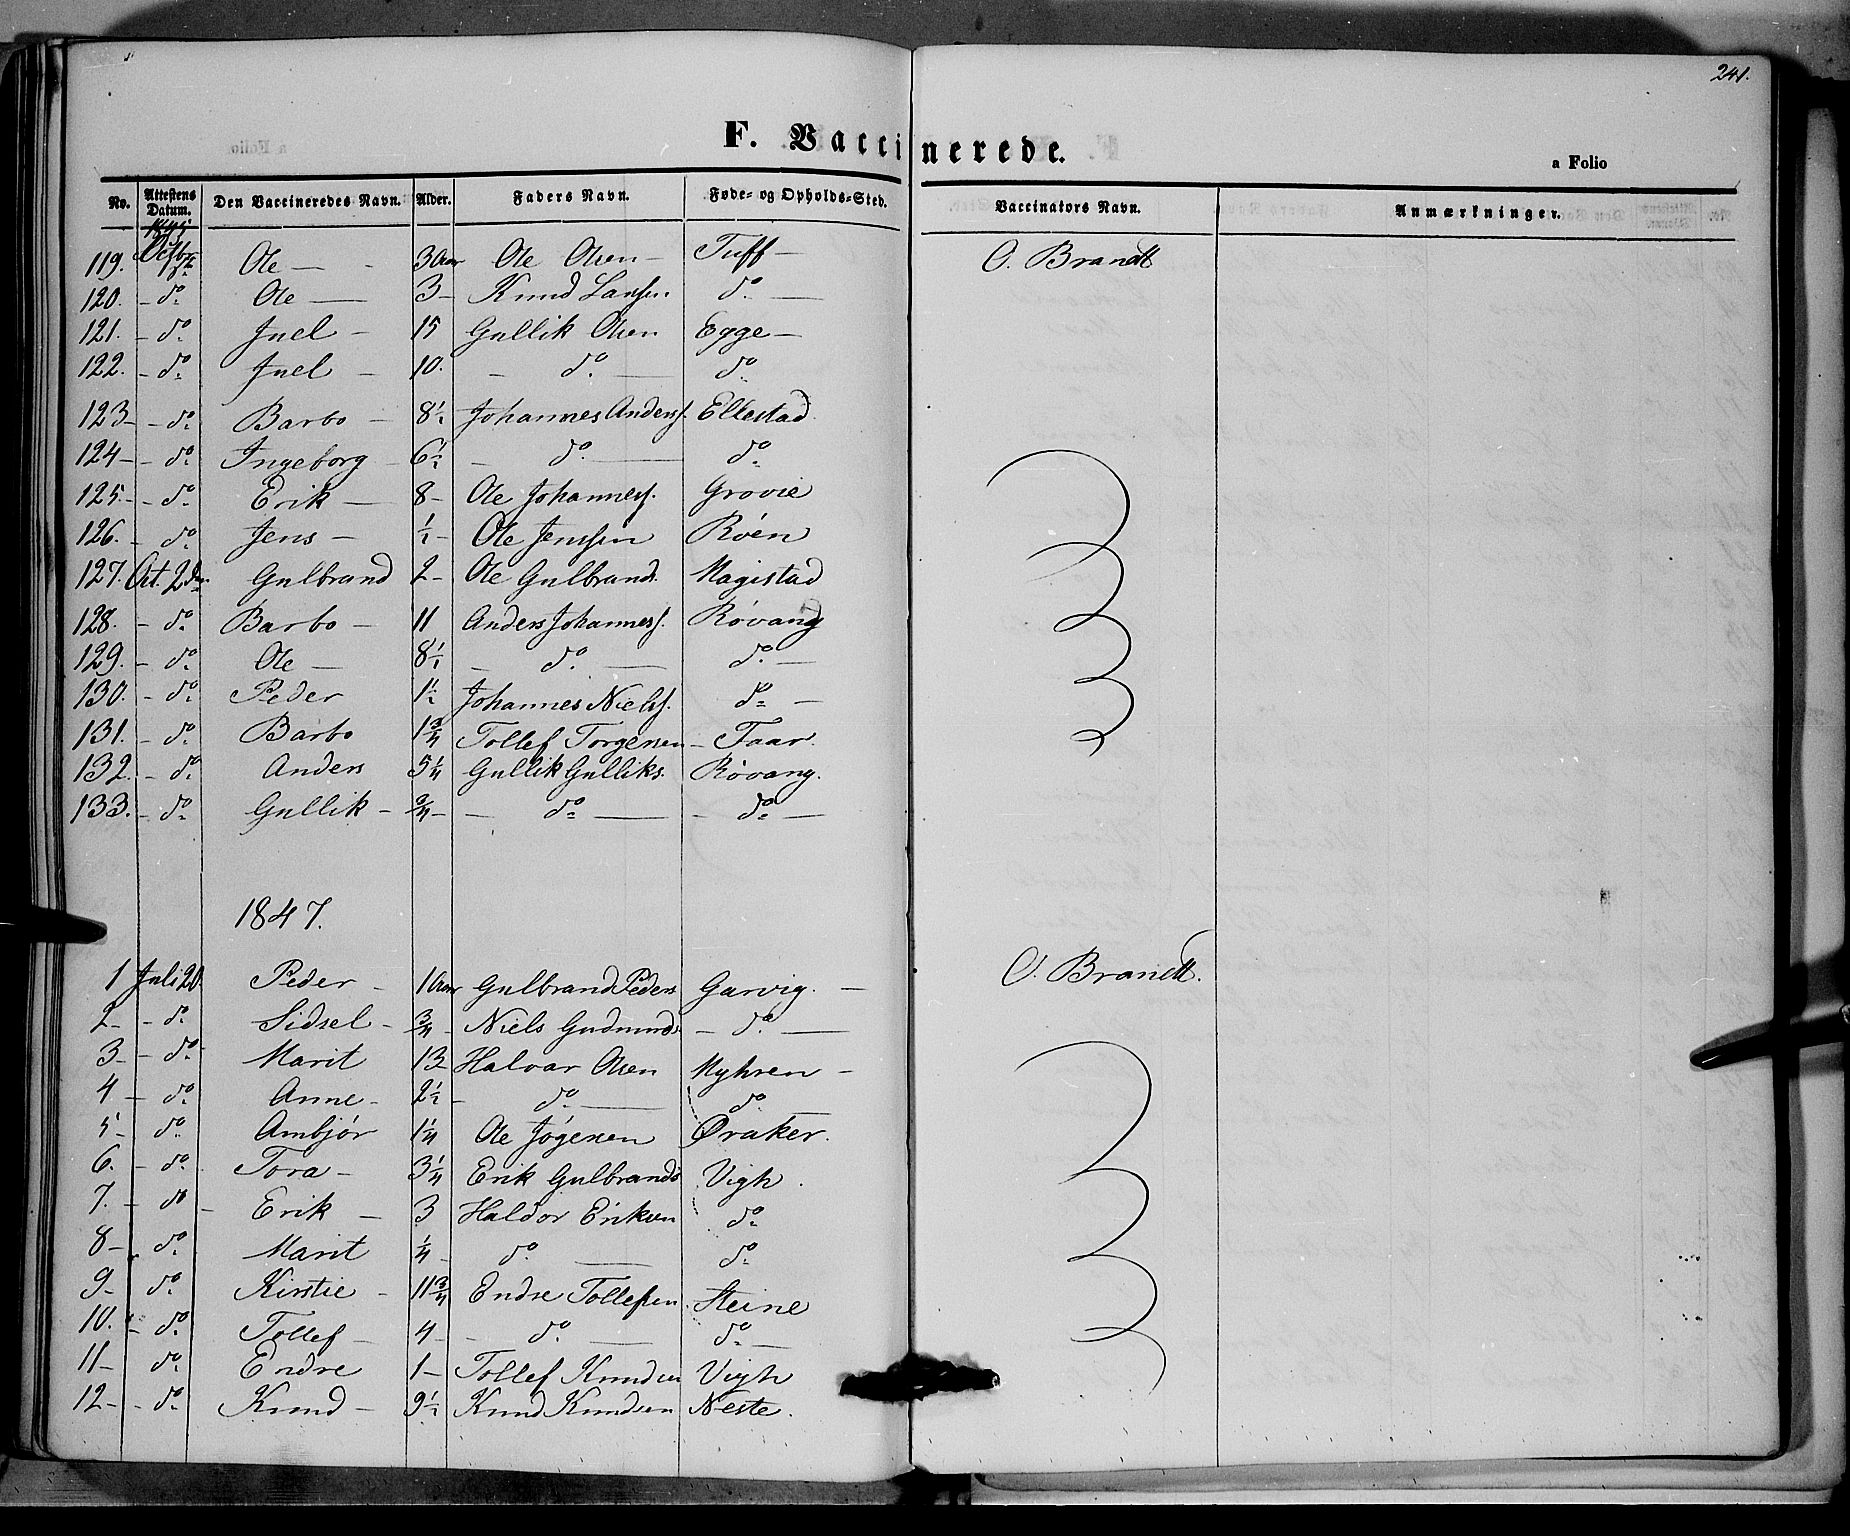 SAH, Vestre Slidre prestekontor, Ministerialbok nr. 1, 1844-1855, s. 241